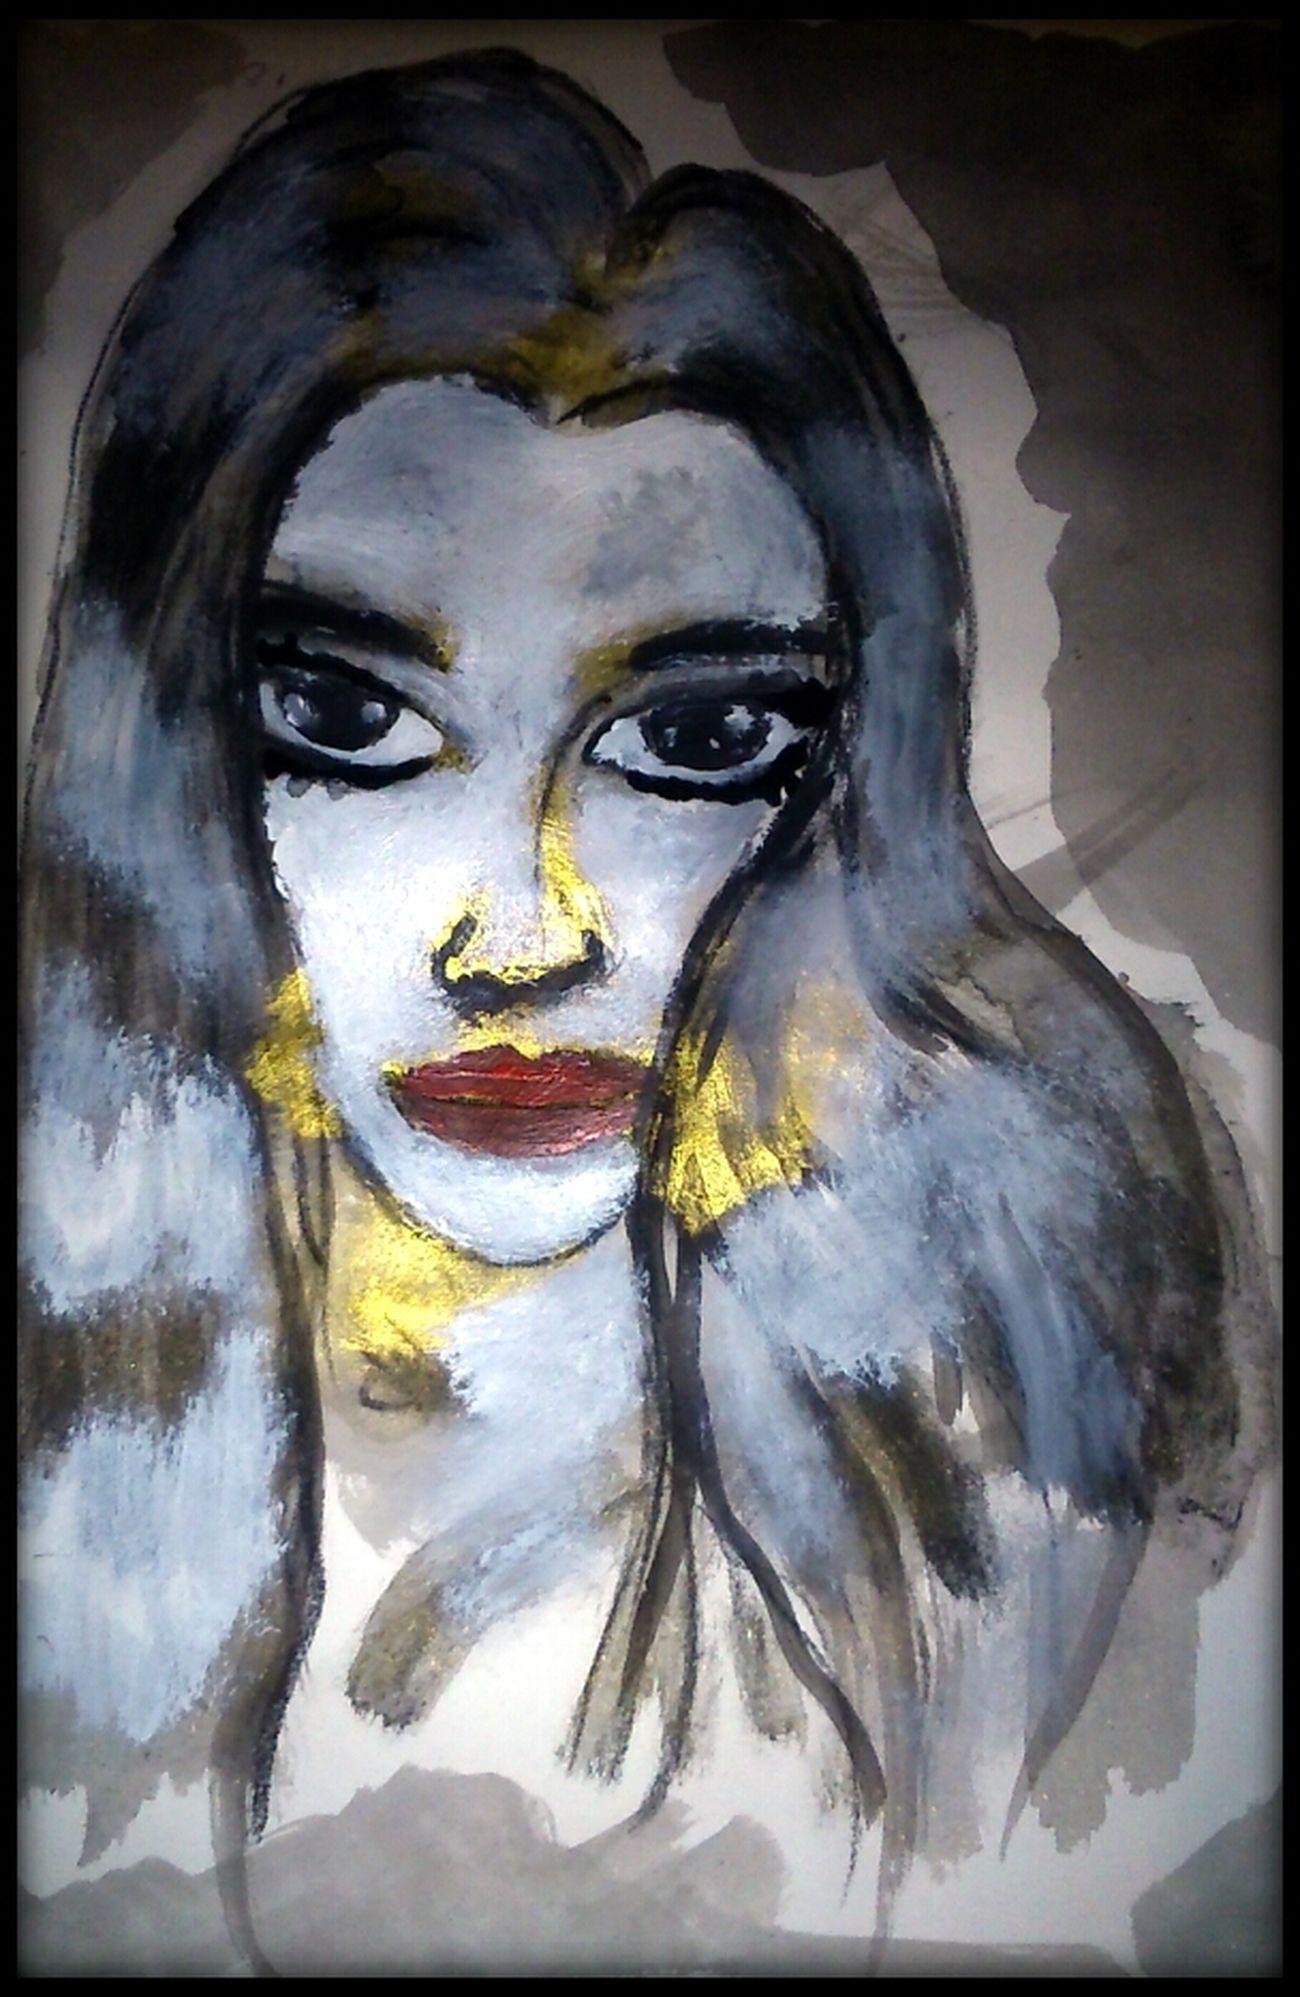 Artistic Human Representation Art And Craft Myartwork Drawing - Art Product Drawing - Activity Sketch